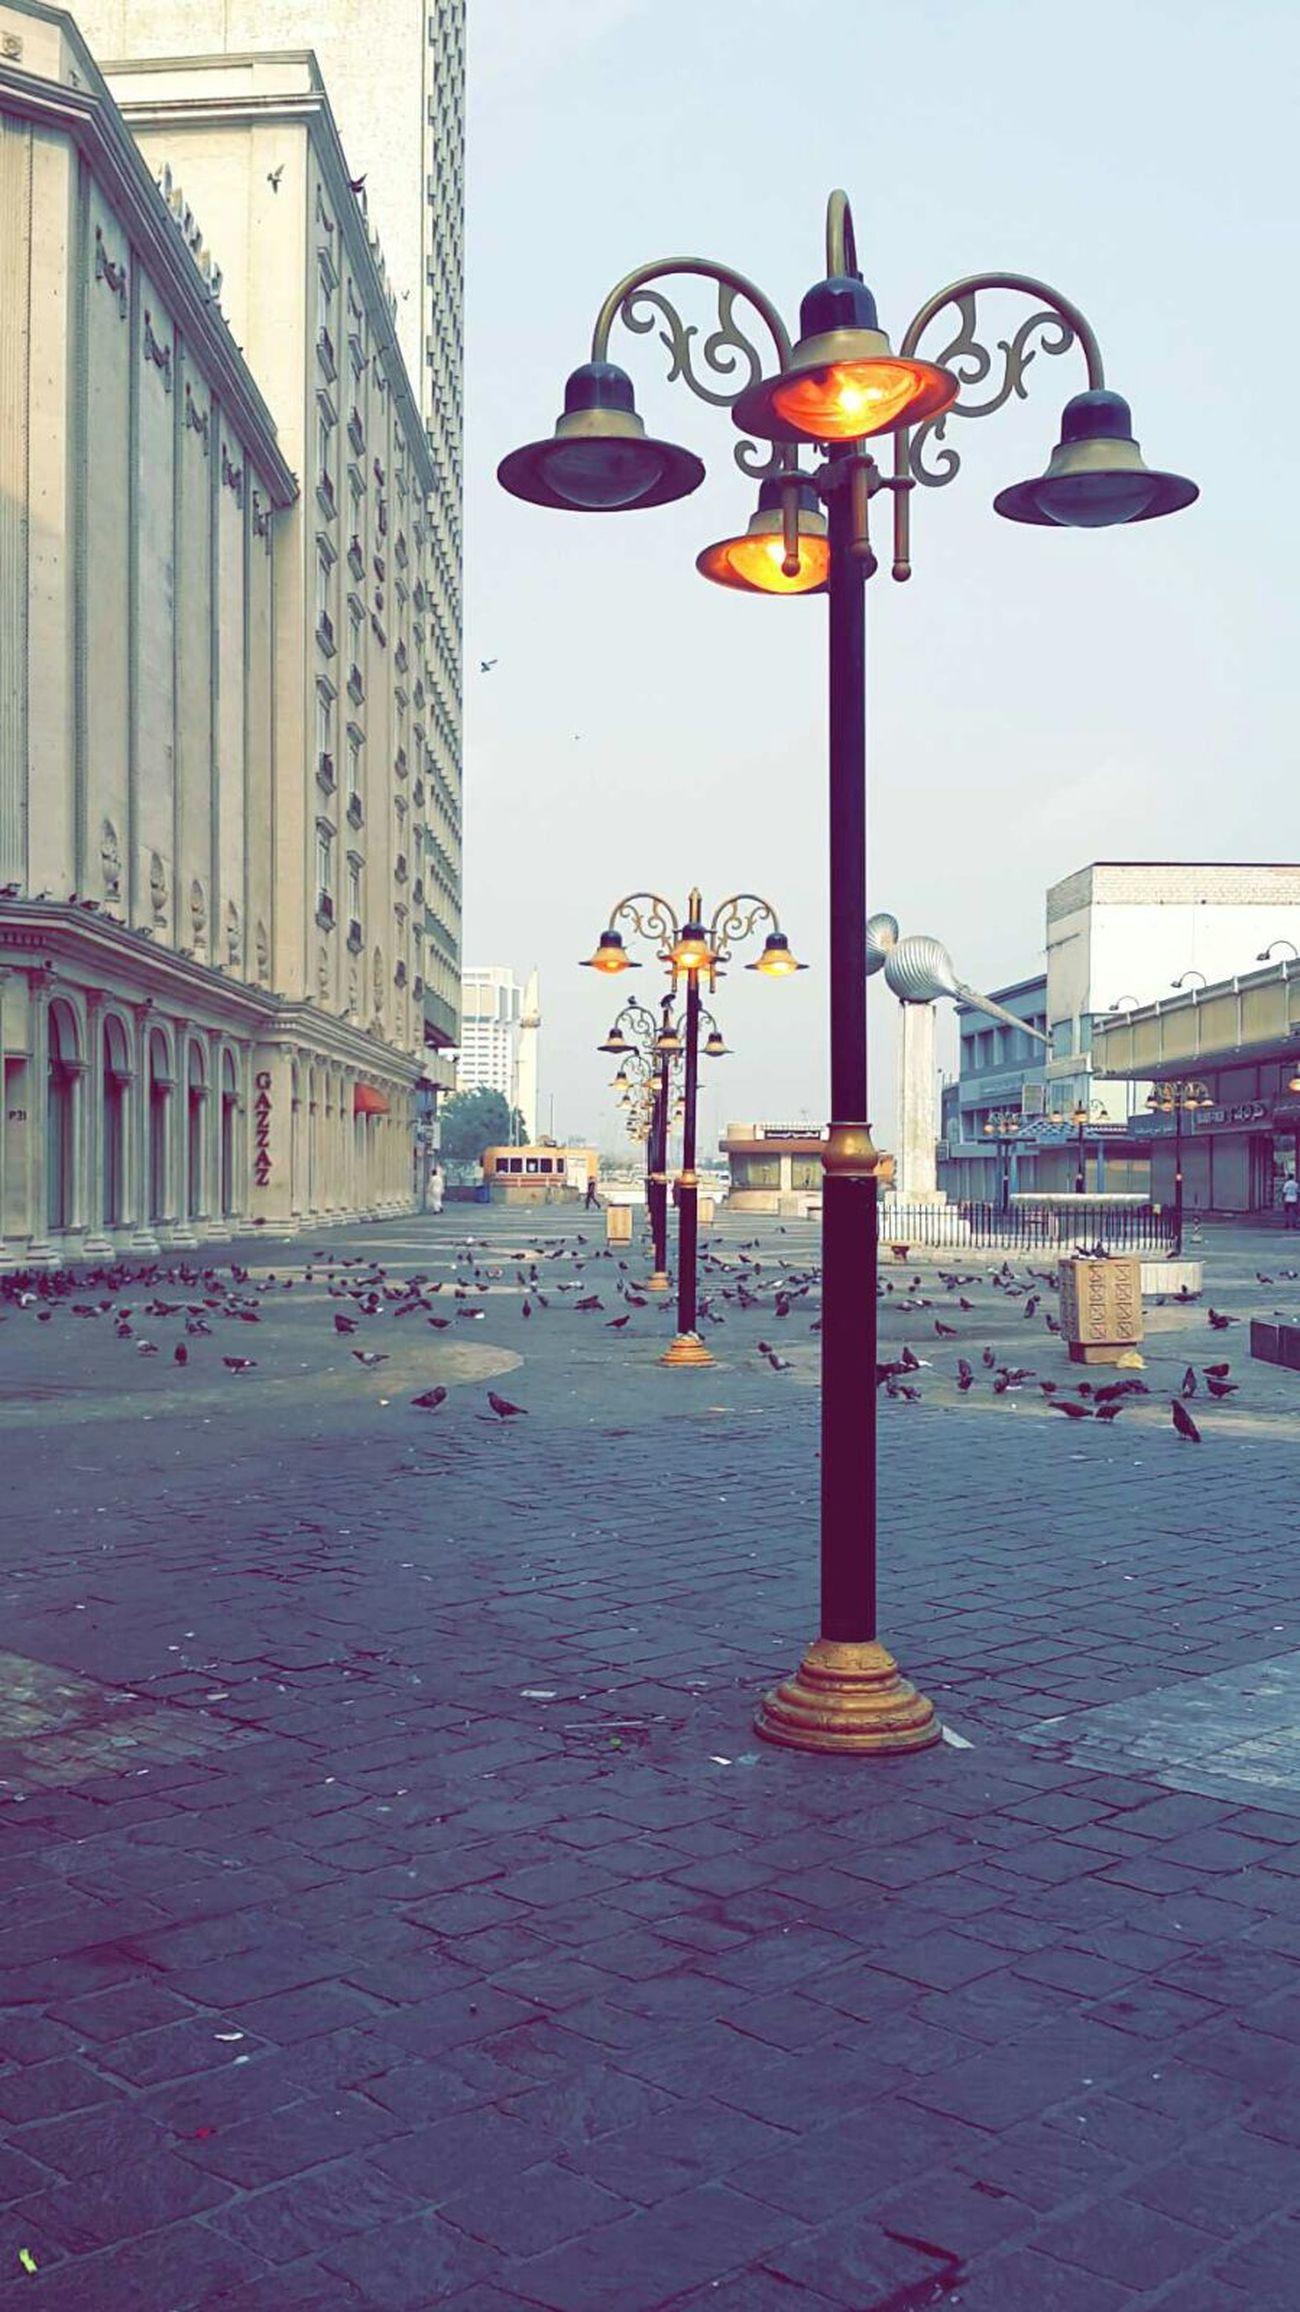 جده Saudi Arabia Jeddah Jeddah City Jeddah_ksa In Jeddah Jeddah😍❤️ Jeddahlife Jeddo With My Sister & I Jeddah Morning❤ The Old Jeddah